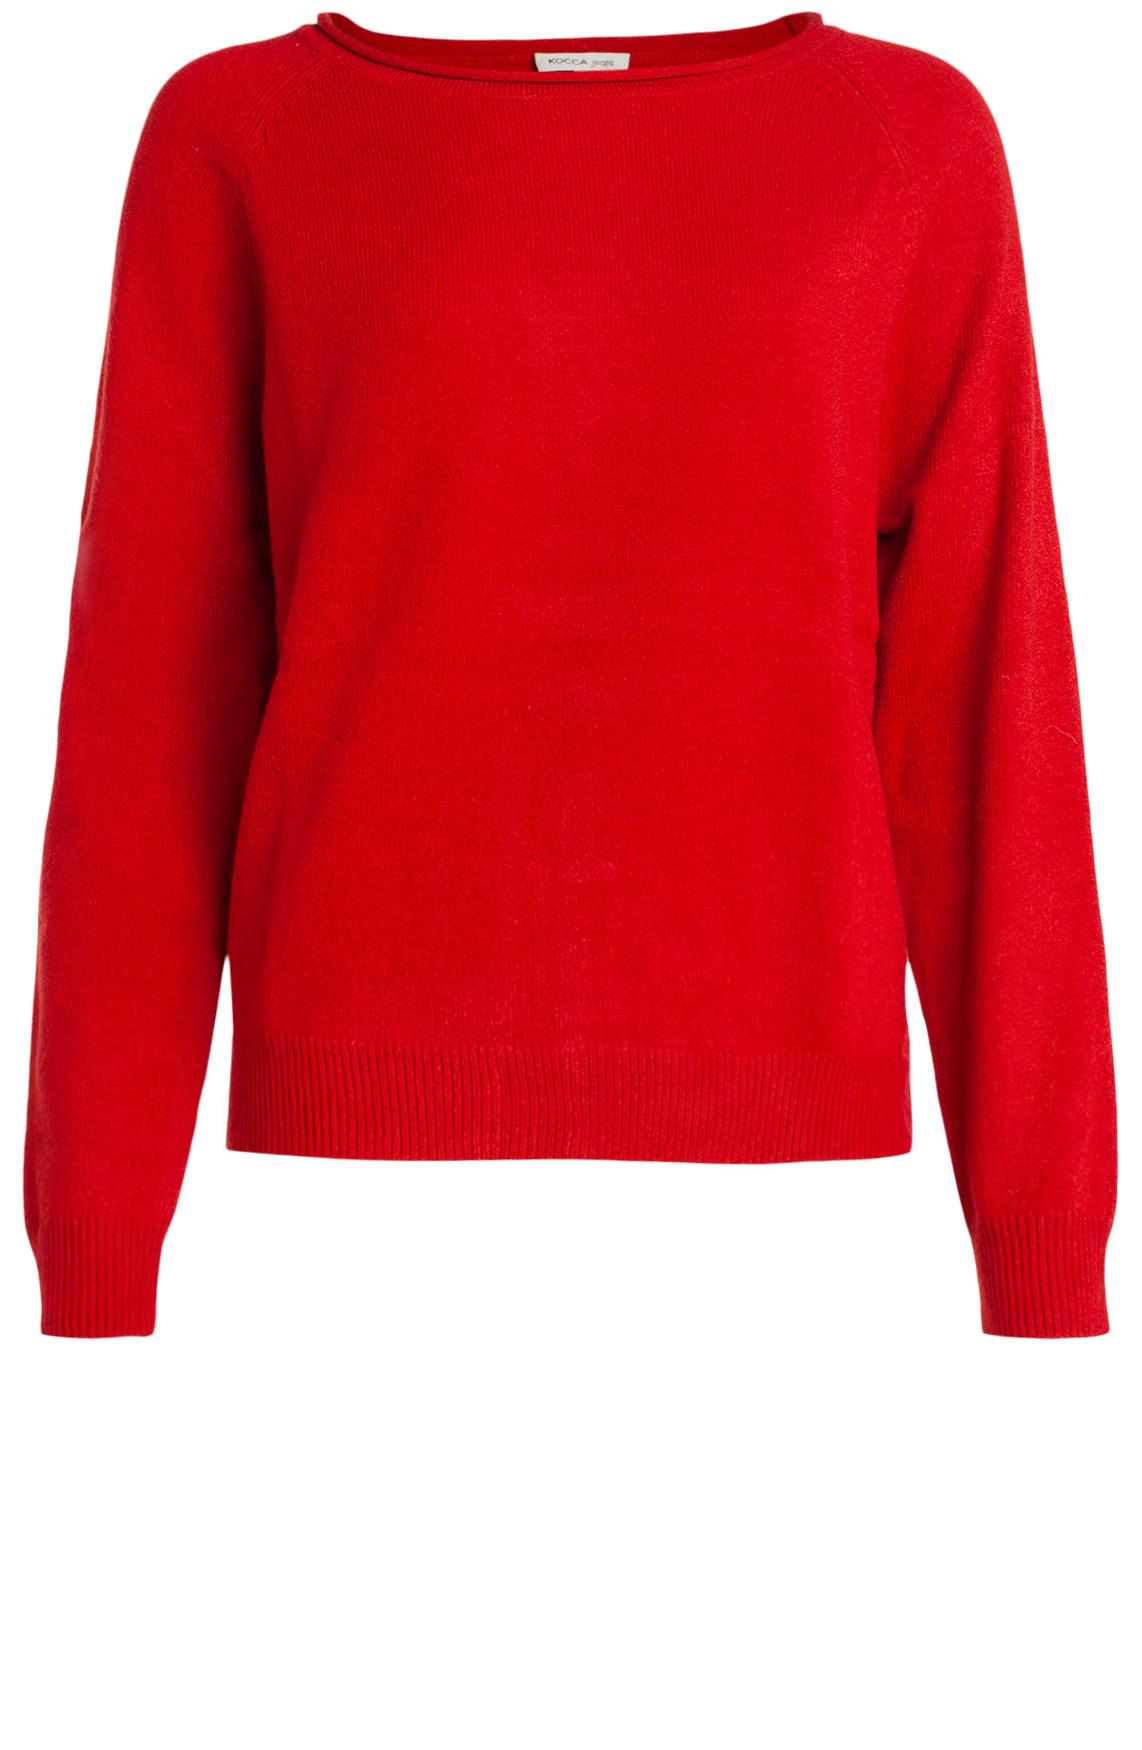 Kocca Dames Enaby pullover met knopen Rood